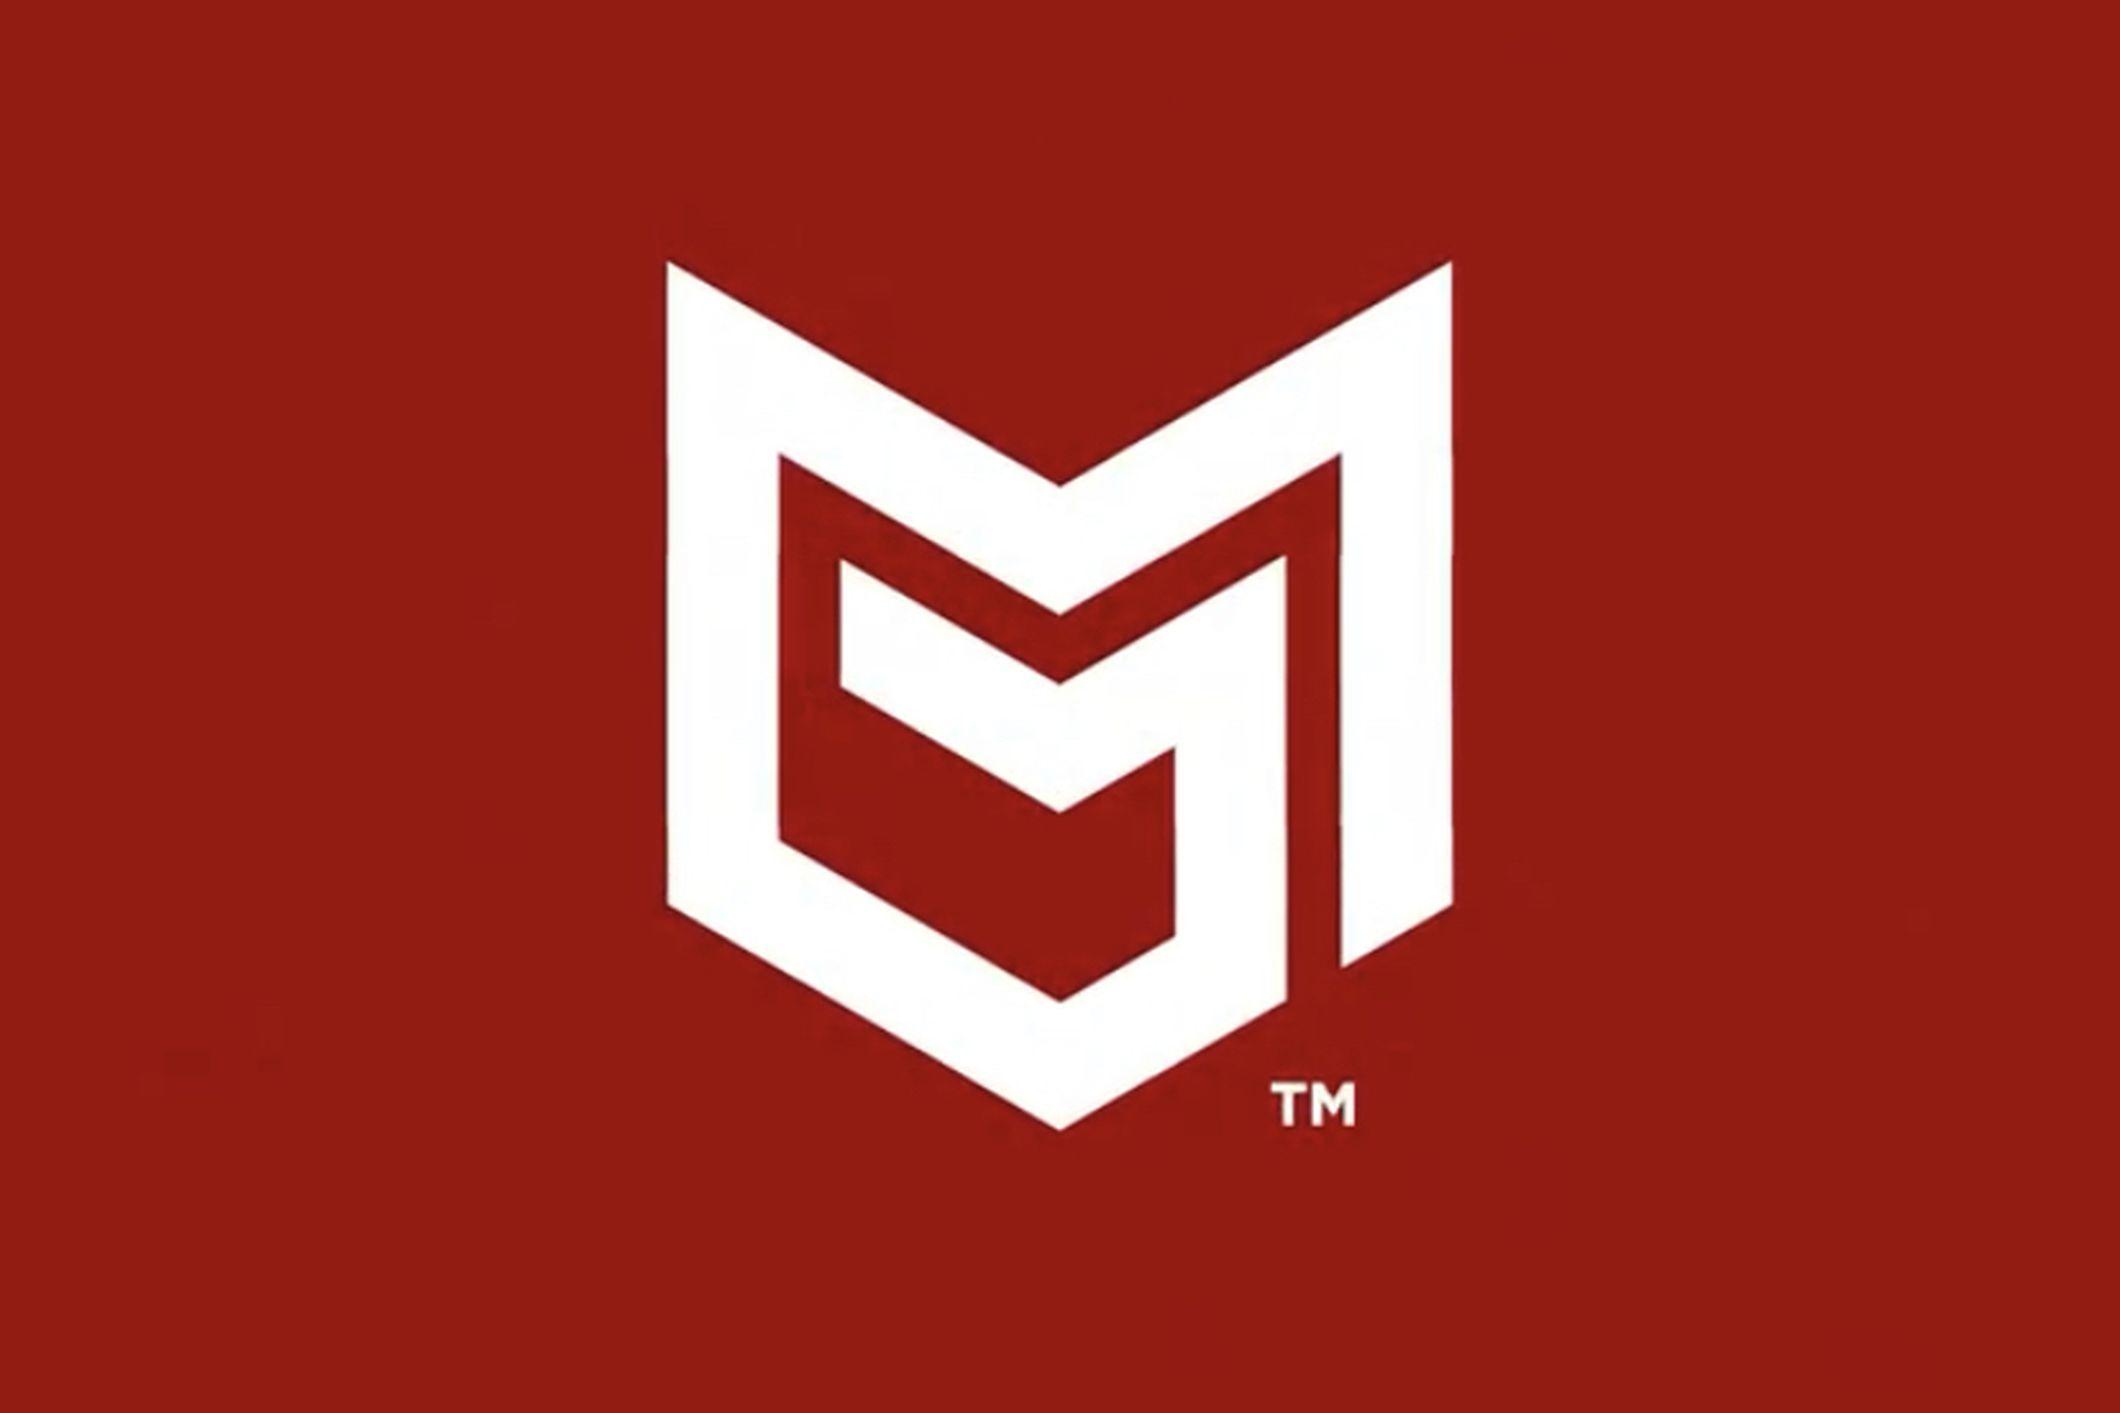 Graham Mertz Reveals a Trademark That is Already Taken